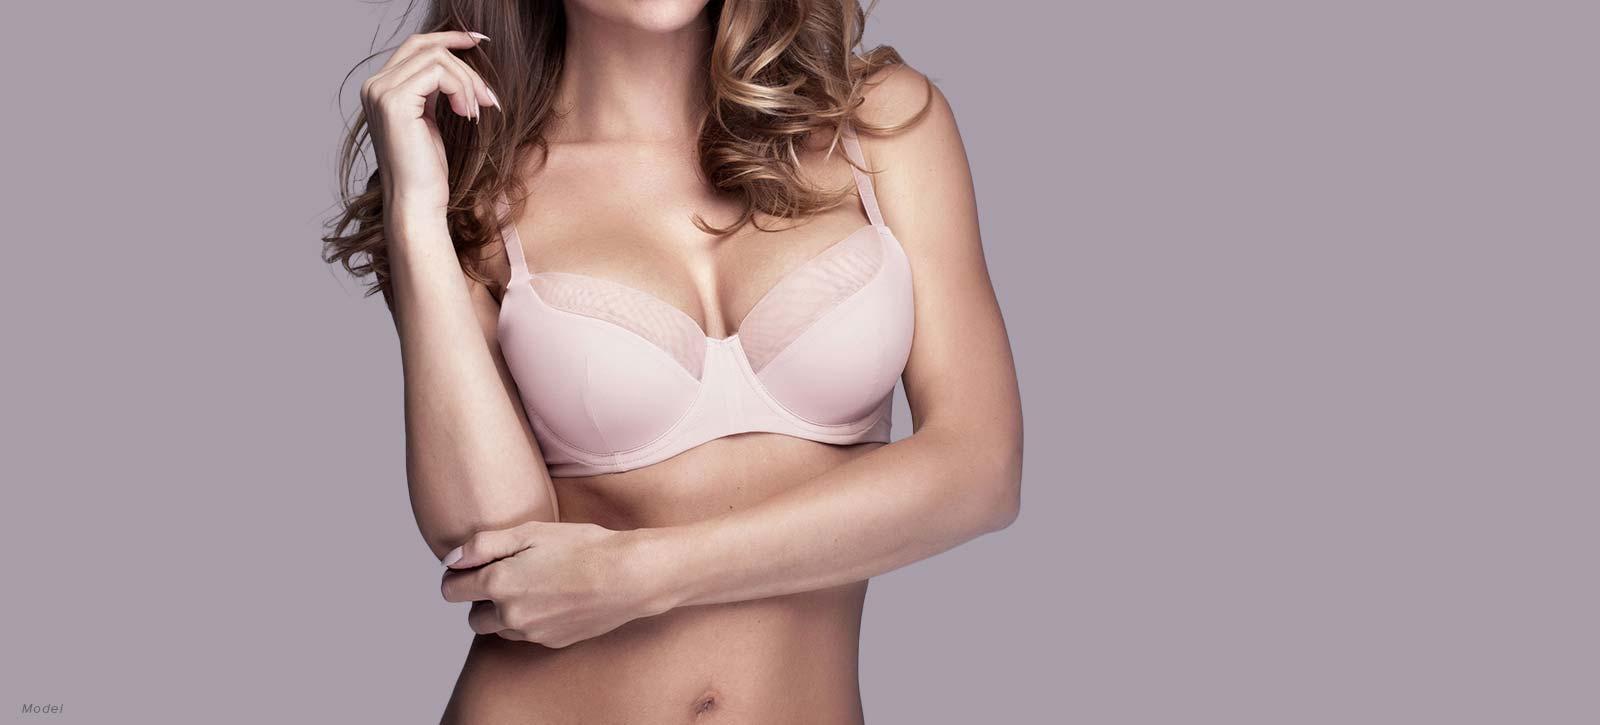 woman's body, wearing pink bra